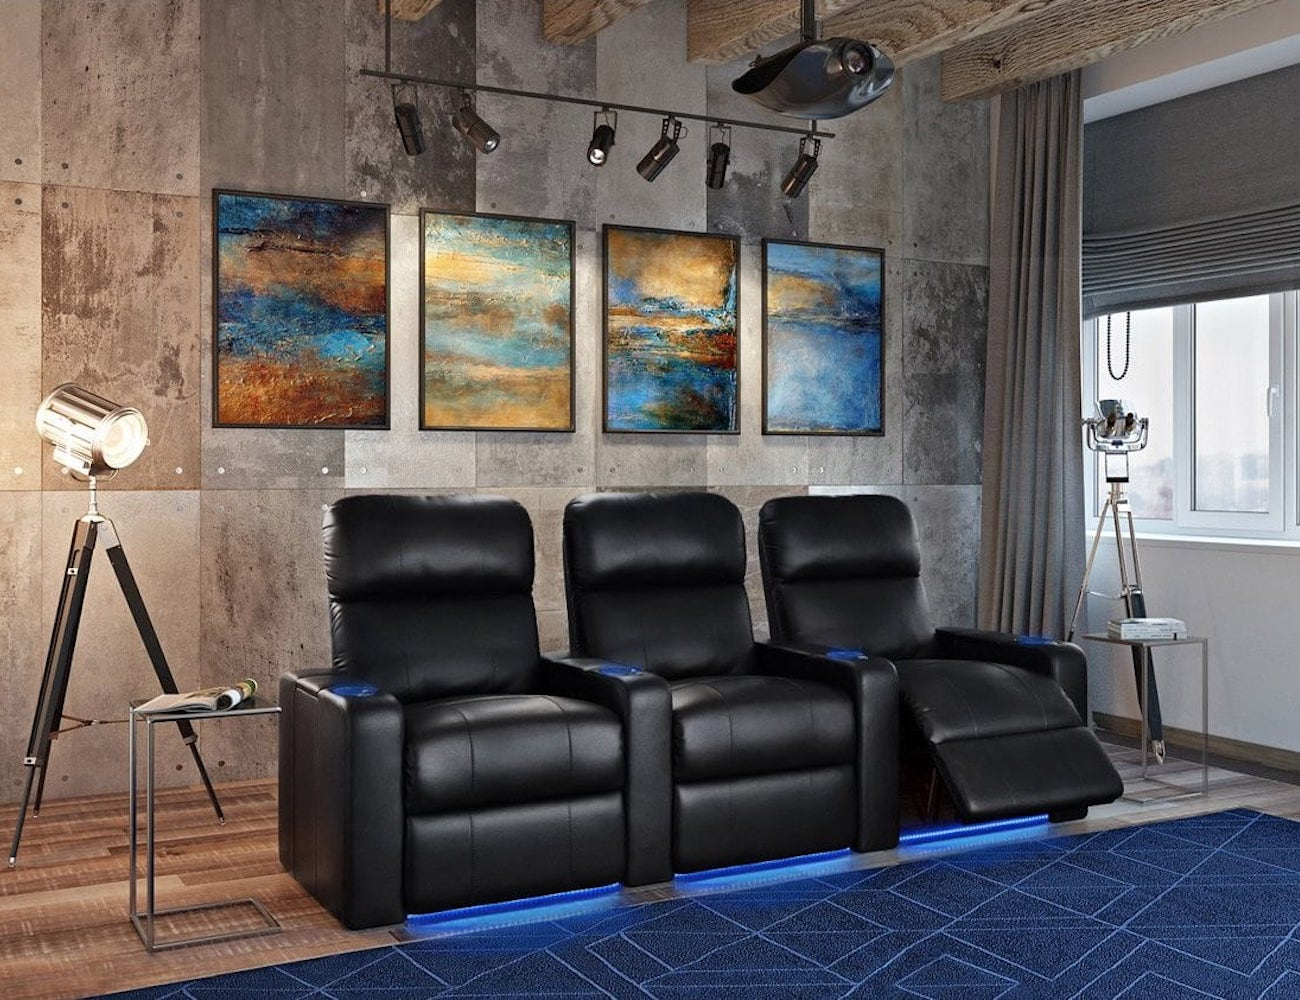 Octane Turbo XL700 Premium Home Theater Seating